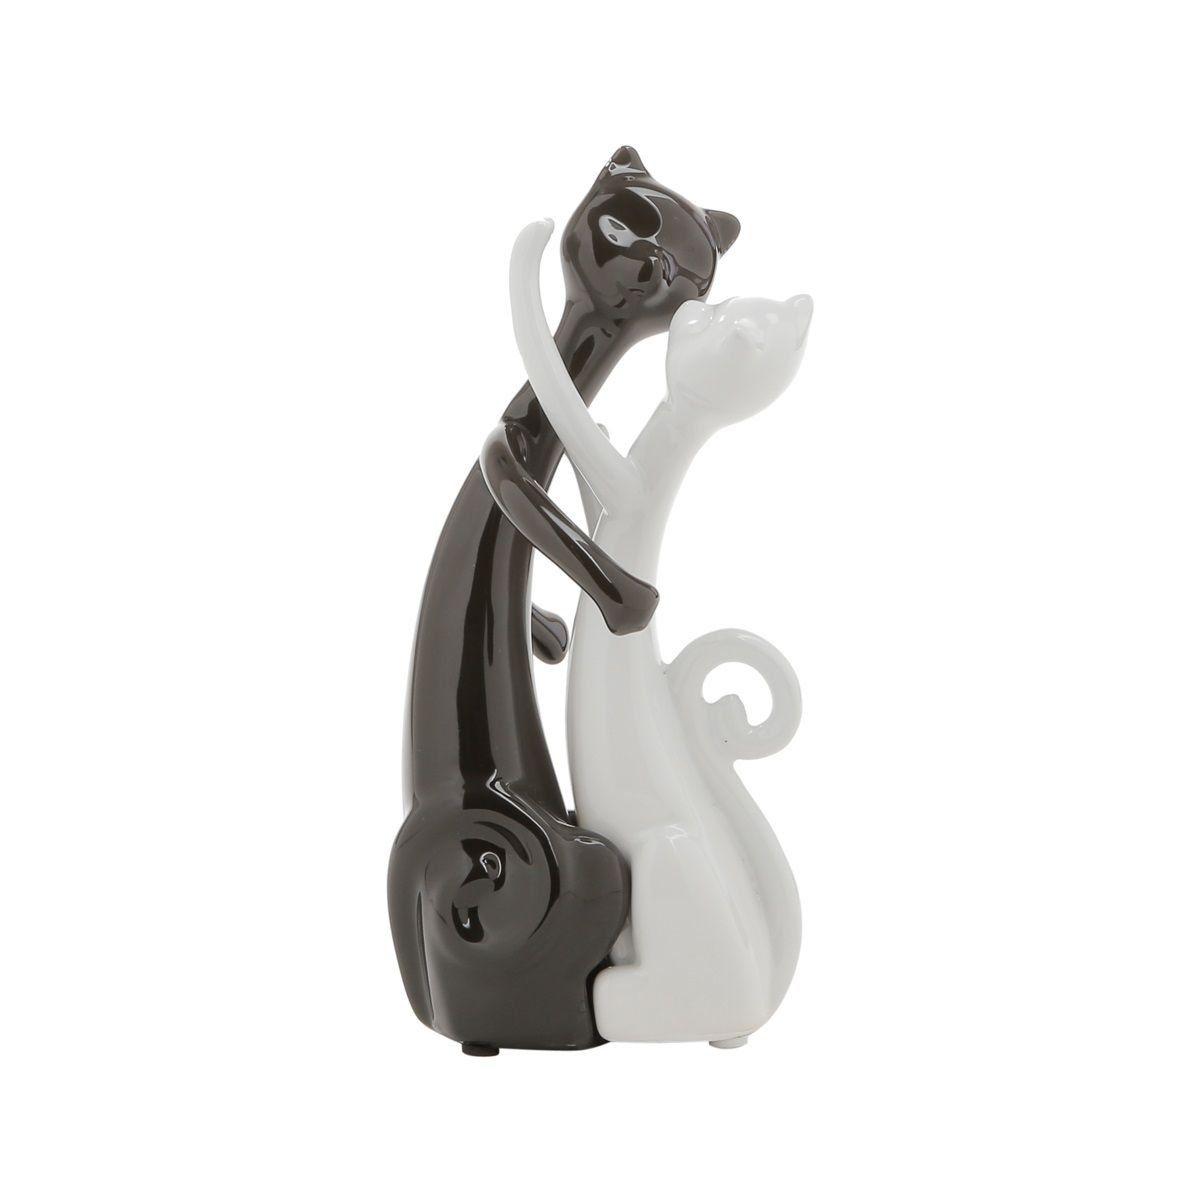 Estatueta 19,5 cm de cerâmica branco e preto Casal Gatos Namorando Prestige - 2797